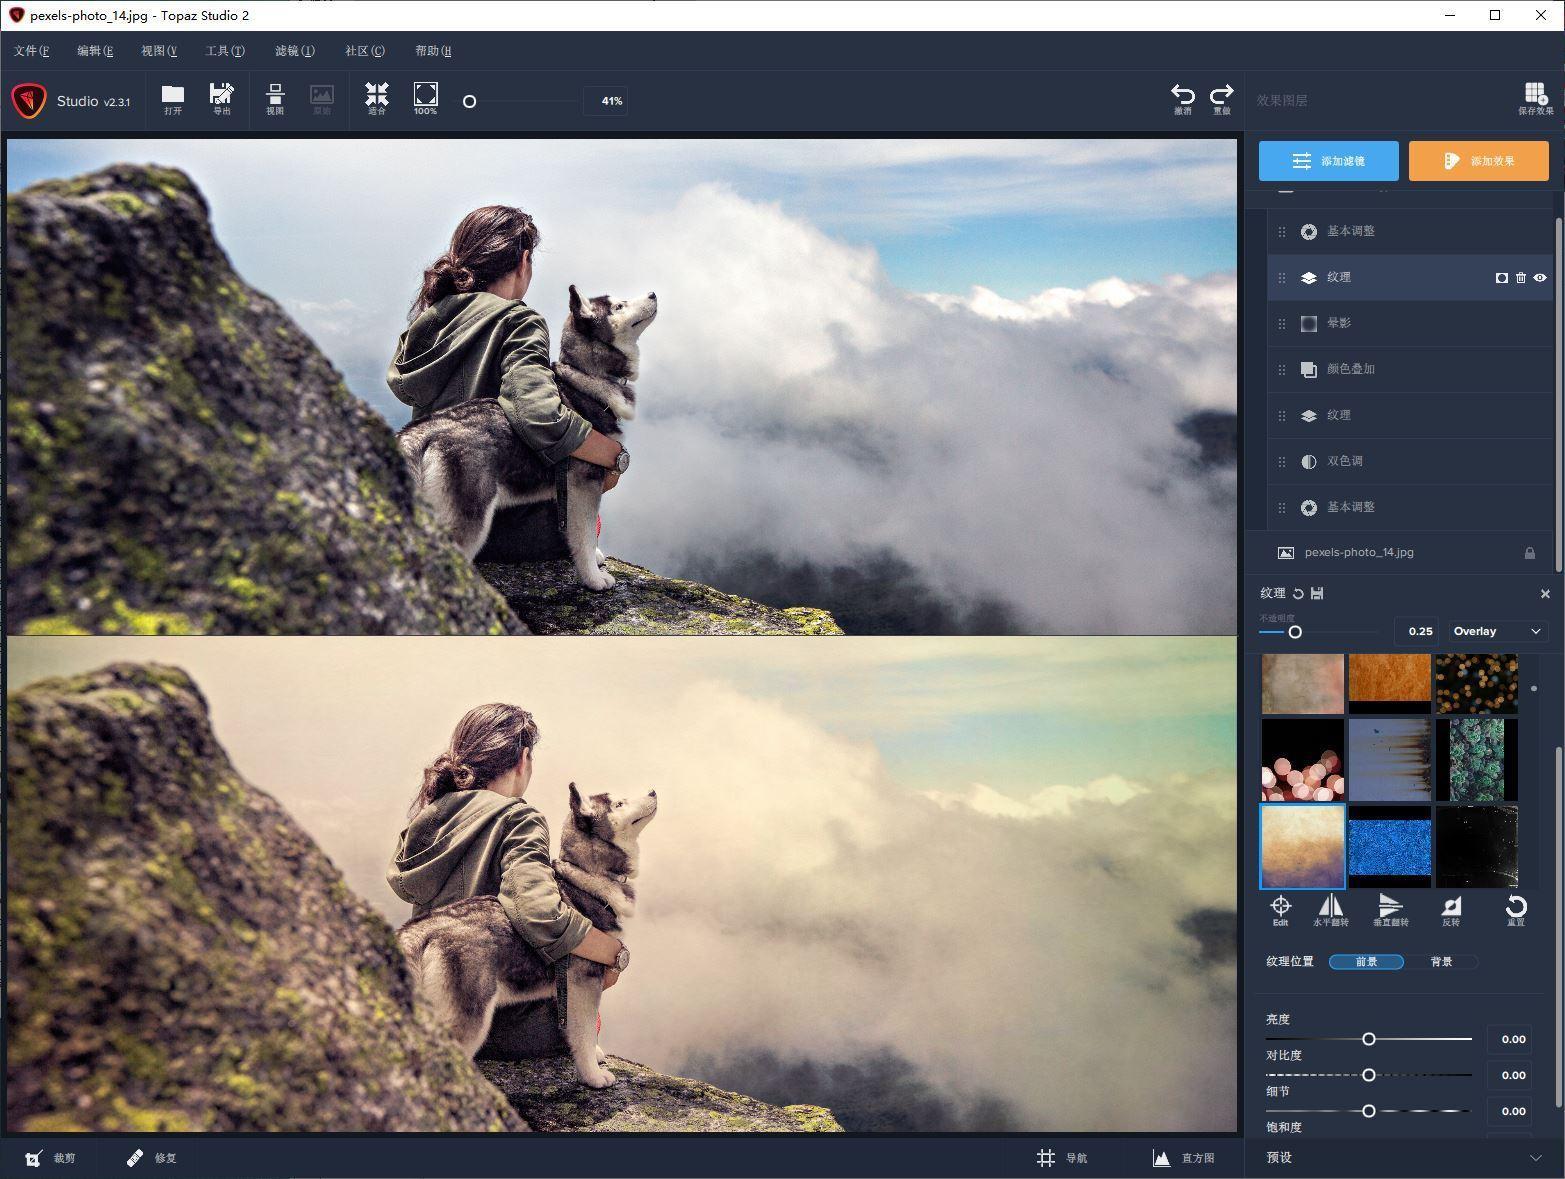 VIP资源-创意照片编辑软件 Topaz Studio 2.3.2 WIN 中文汉化版(2)